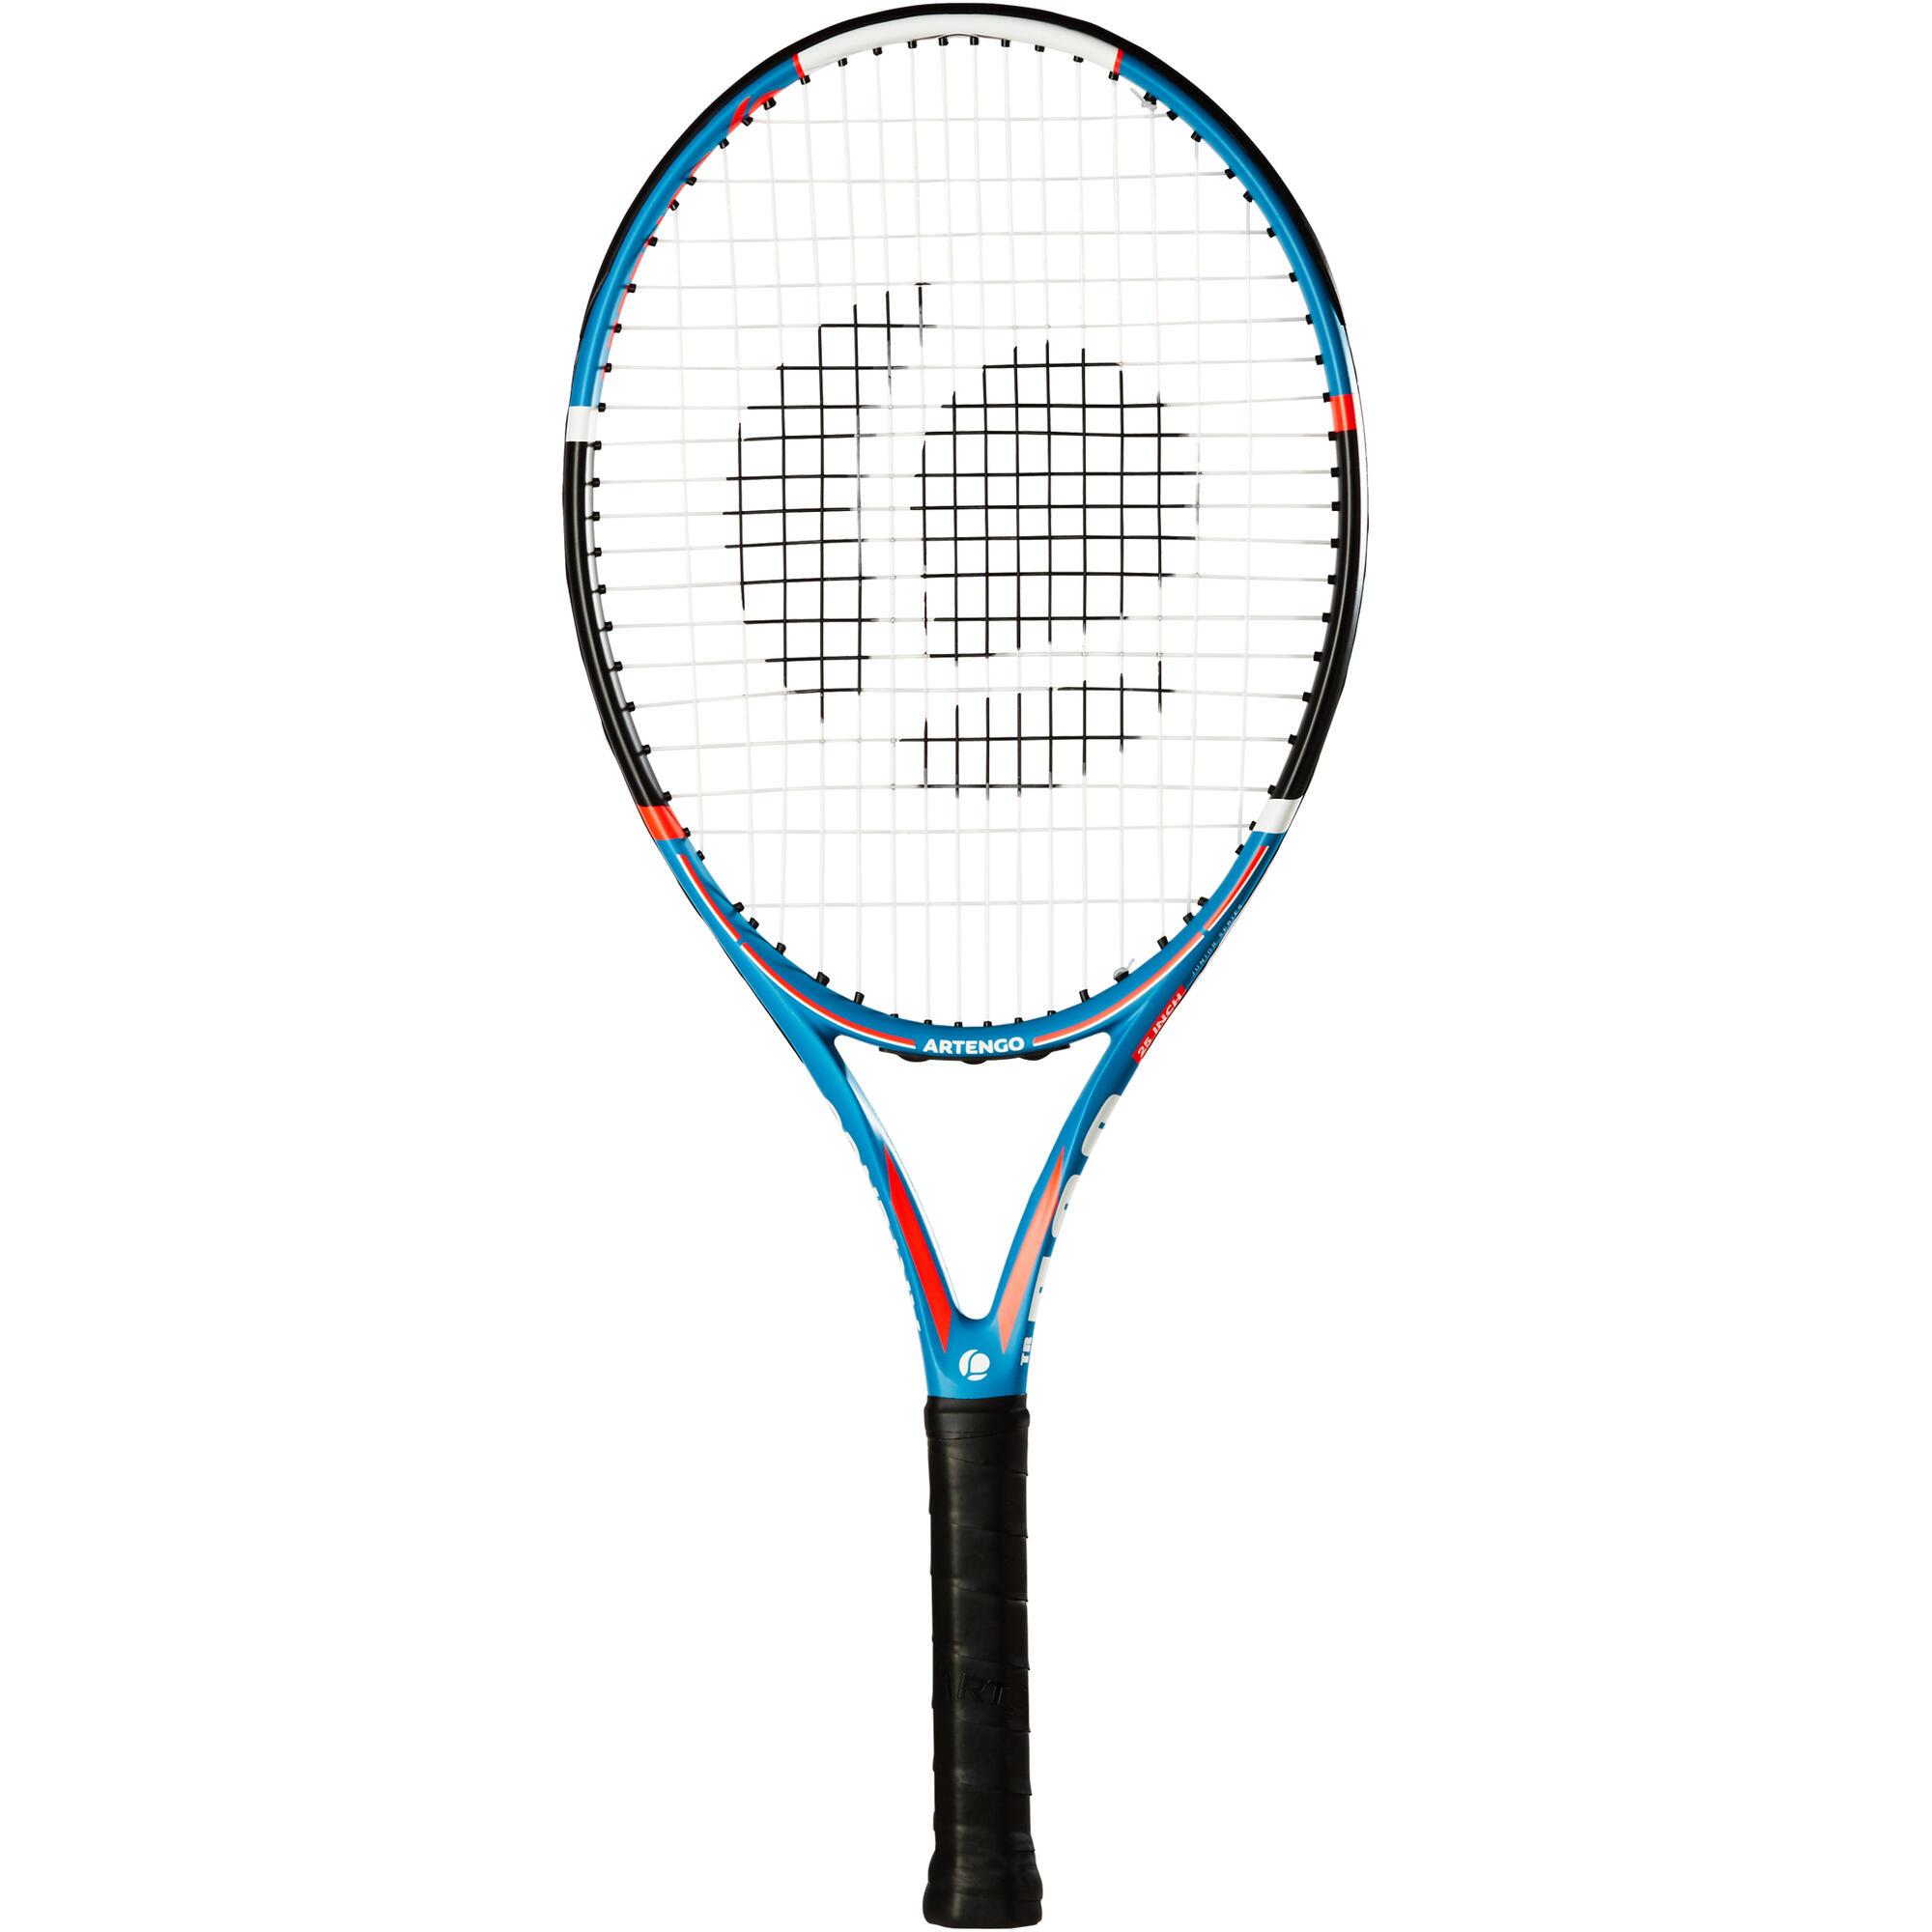 Raquette de tennis enfant tr530 25 bleu artengo - Raquette de tennis de table decathlon ...